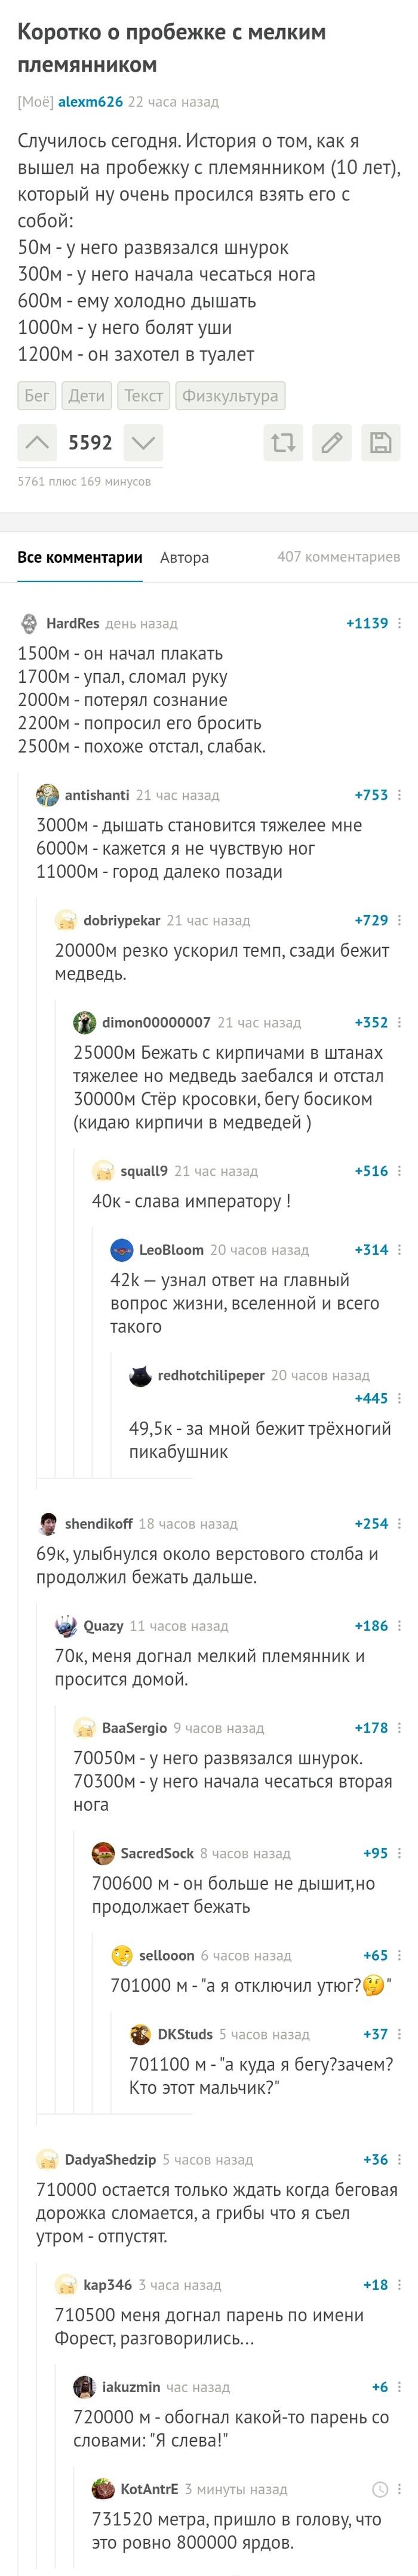 Дневник бегуна Скриншот, Пробежка, Сын, Юмор, Длиннопост